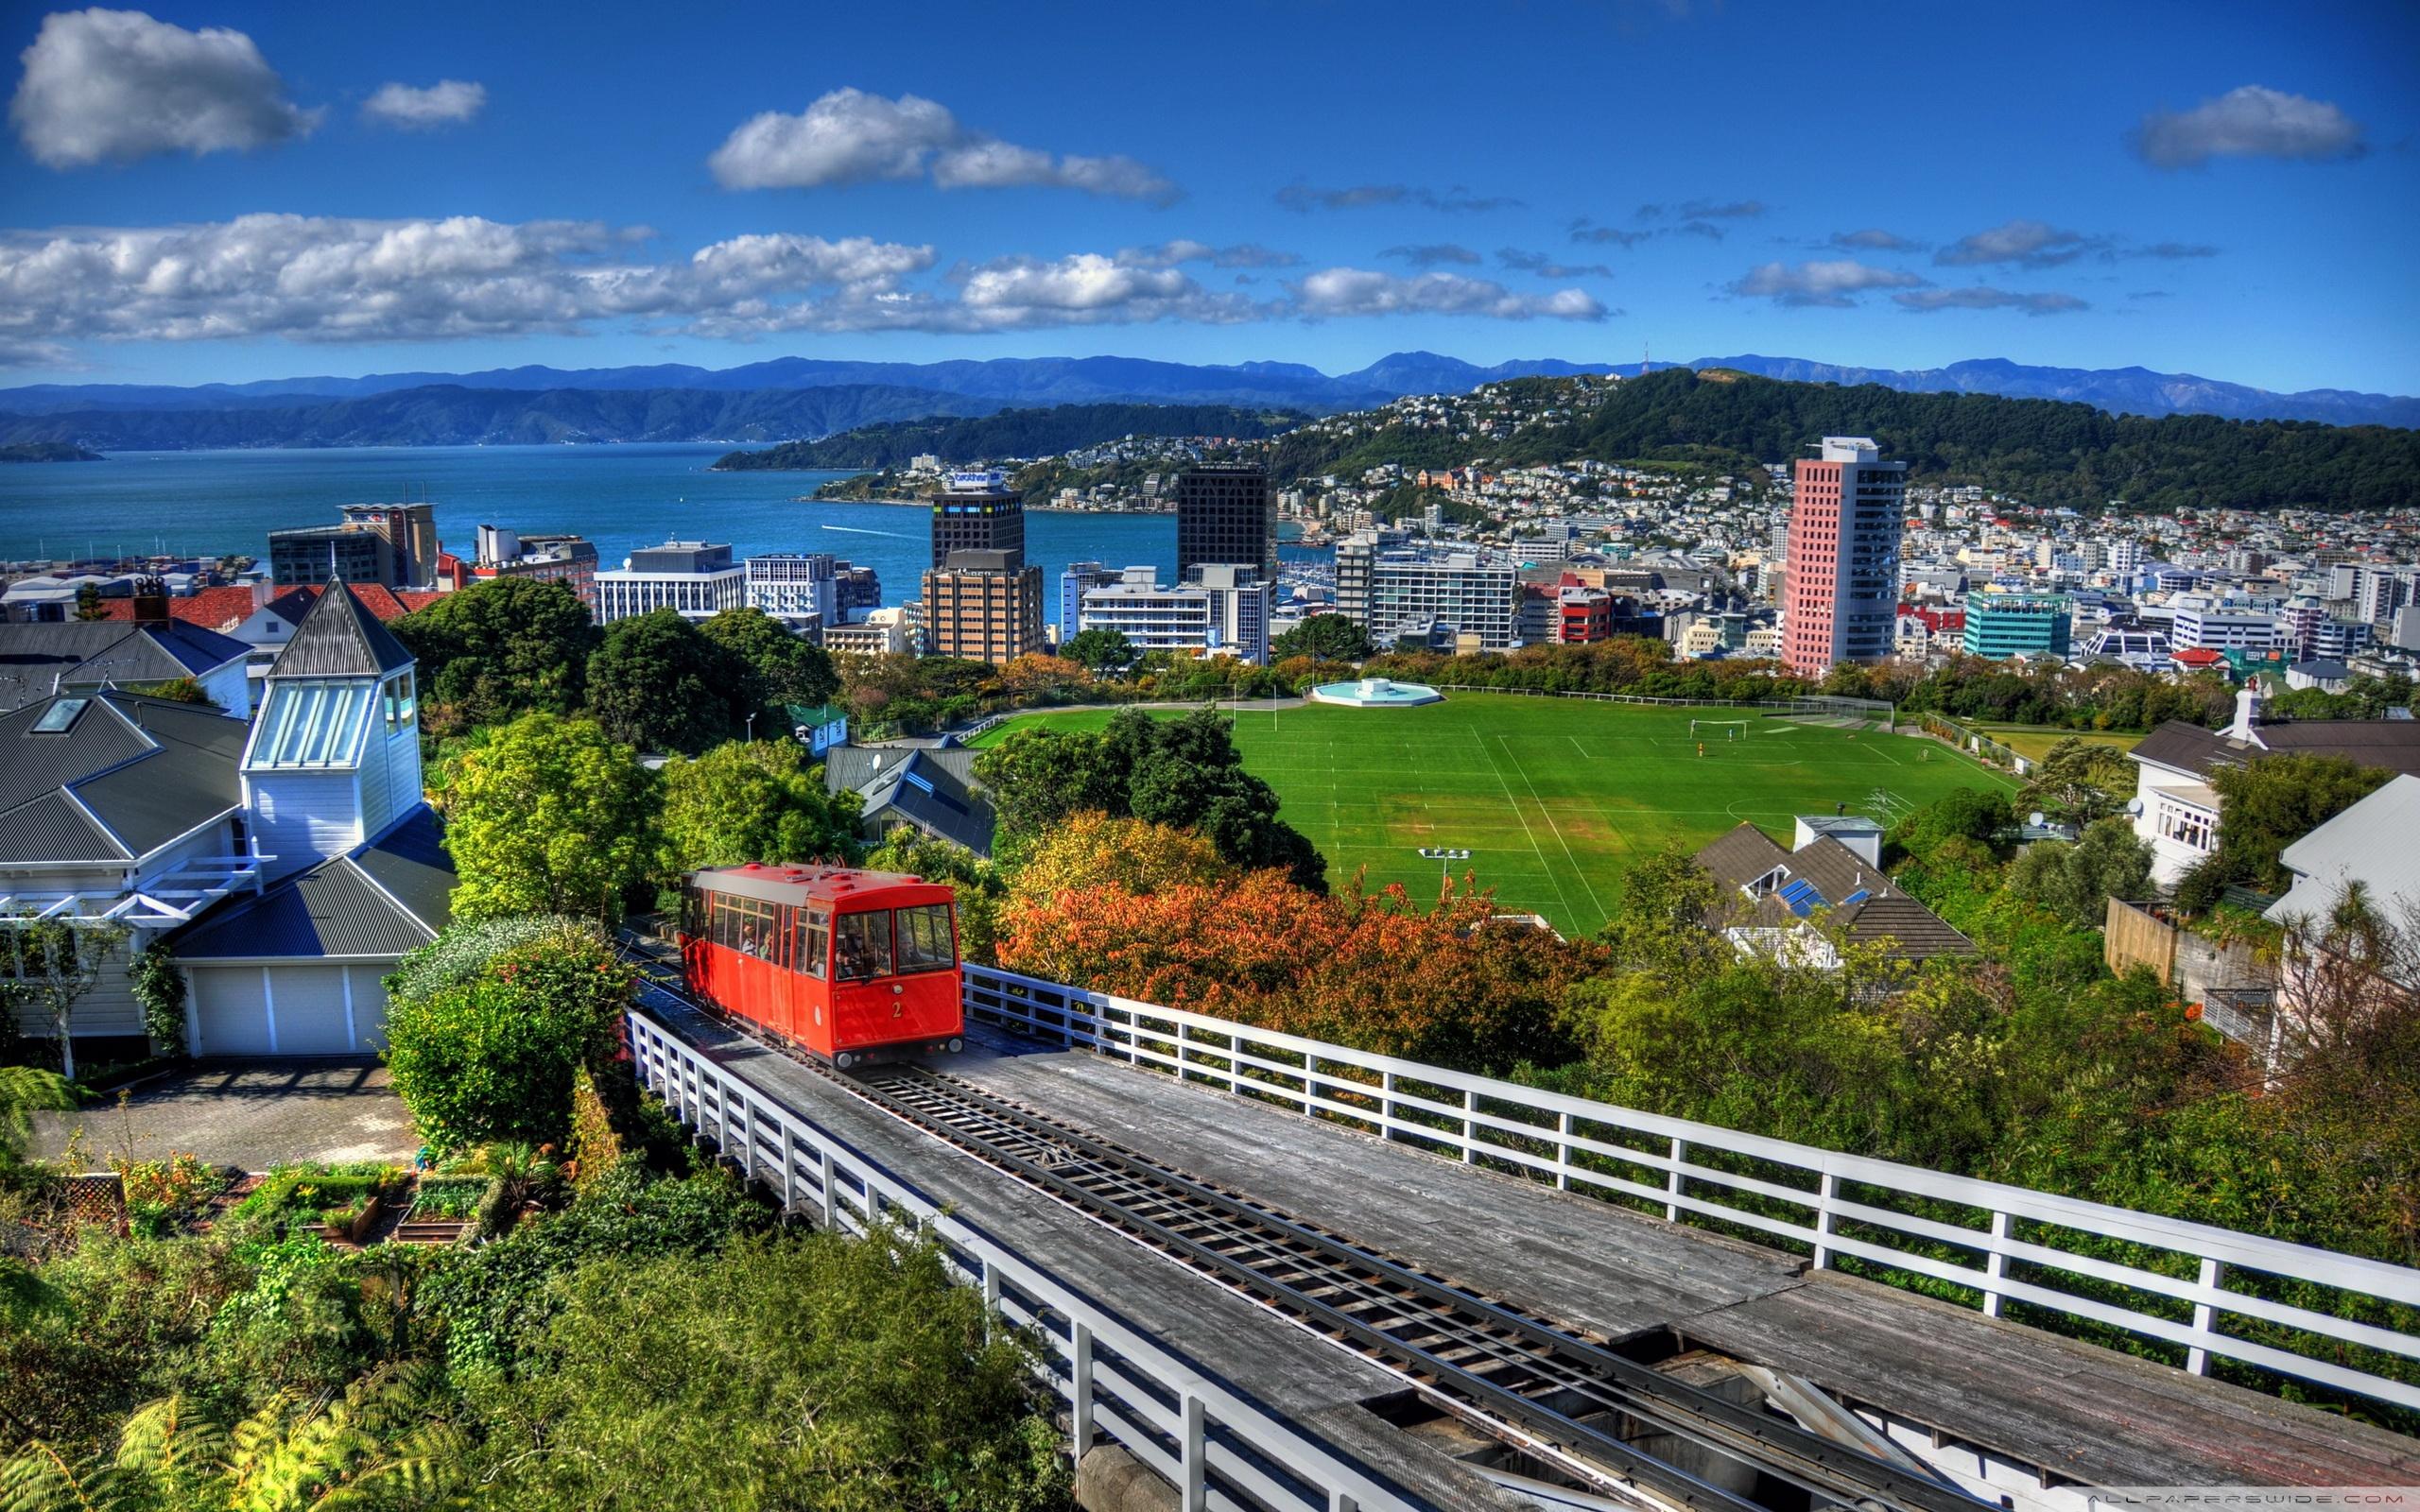 New Zealand Houses Wellington From Above 4K HD Desktop 2560x1600